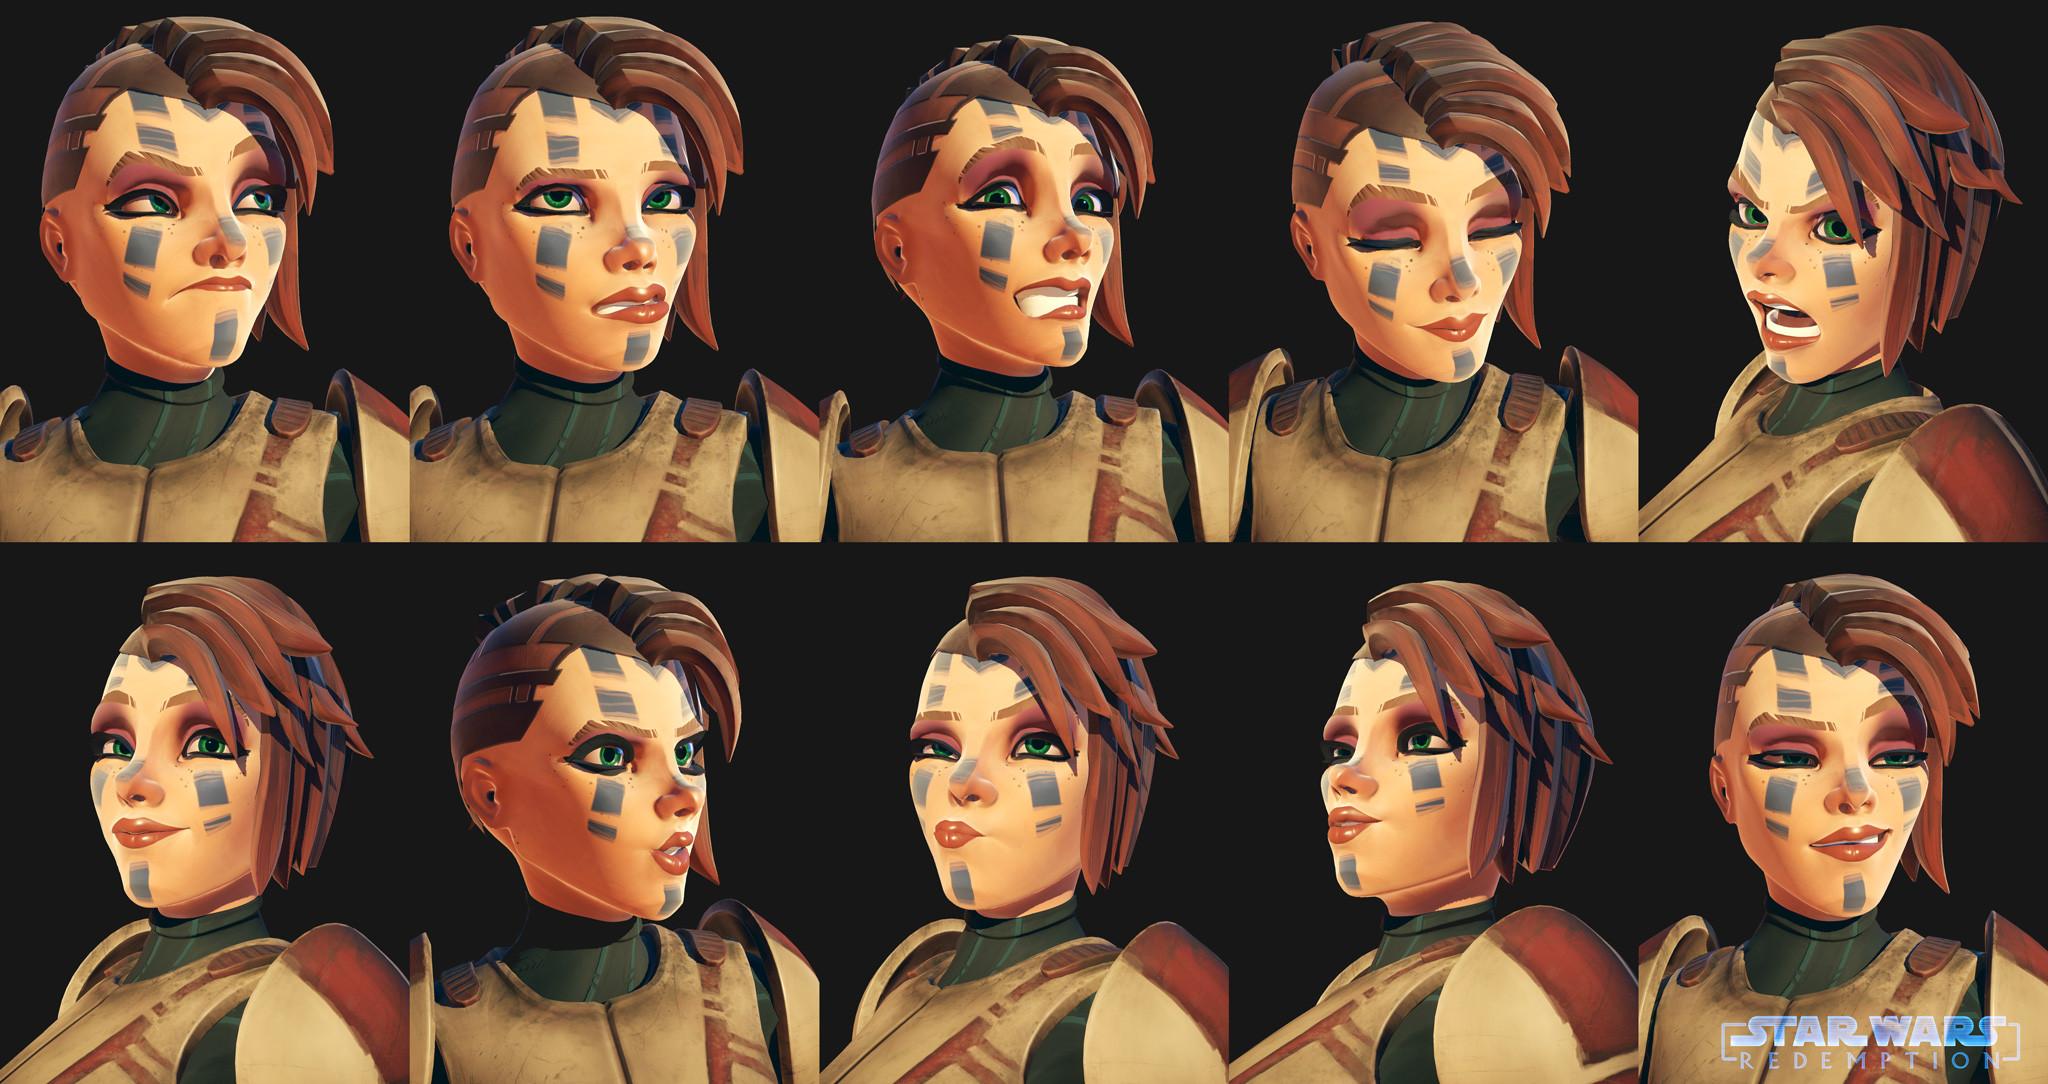 Mevenn - Facial Expressions, rig & anim done on Akeytsu, rendered on Marmoset Toolbag 3